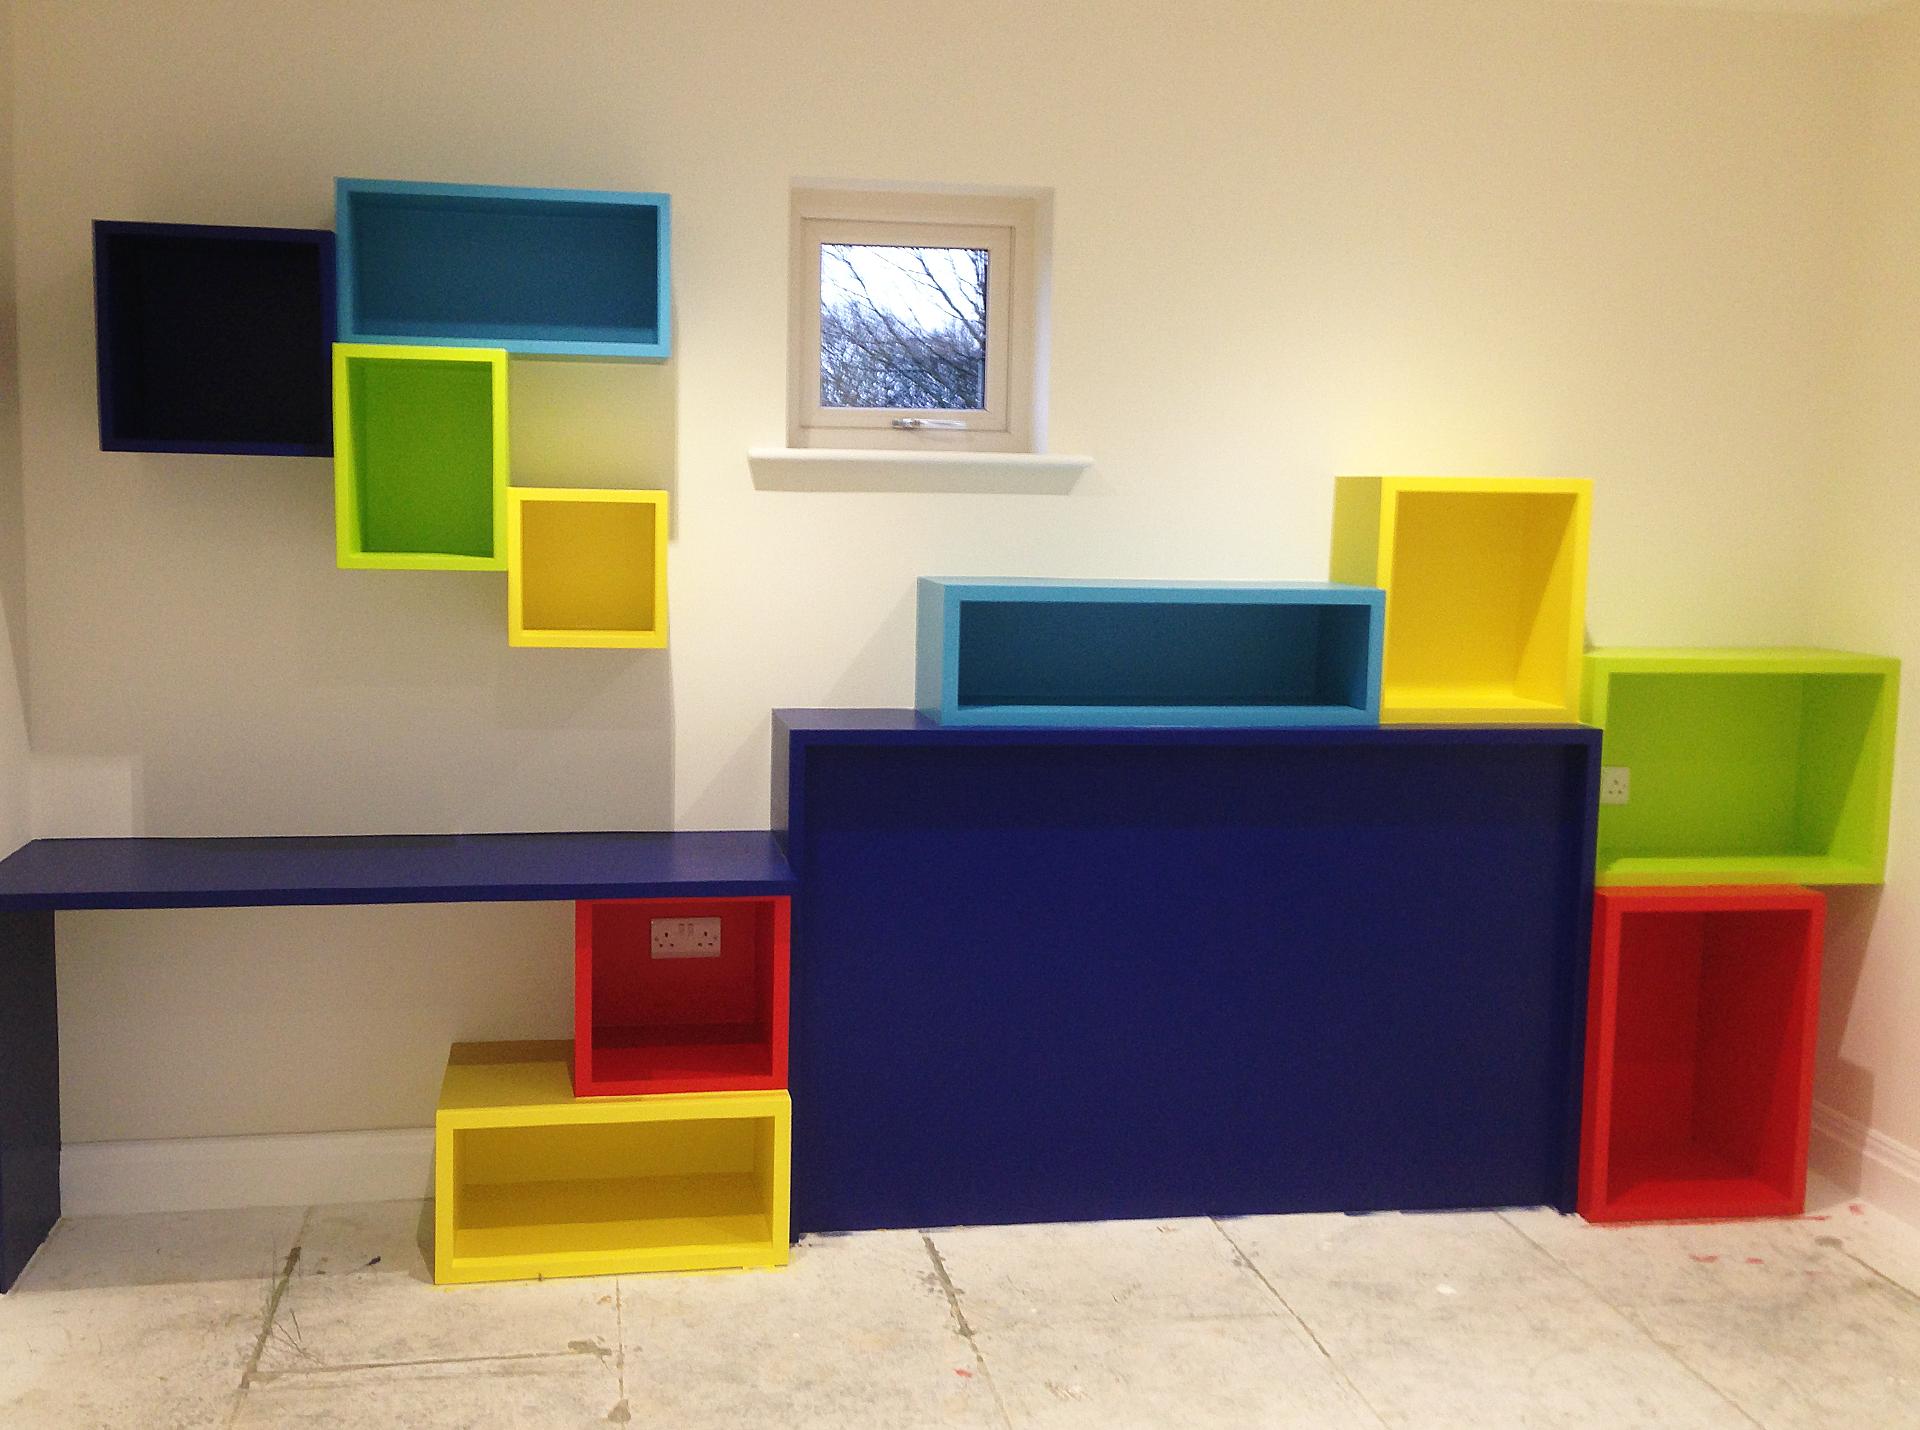 bespoke childrens furniture